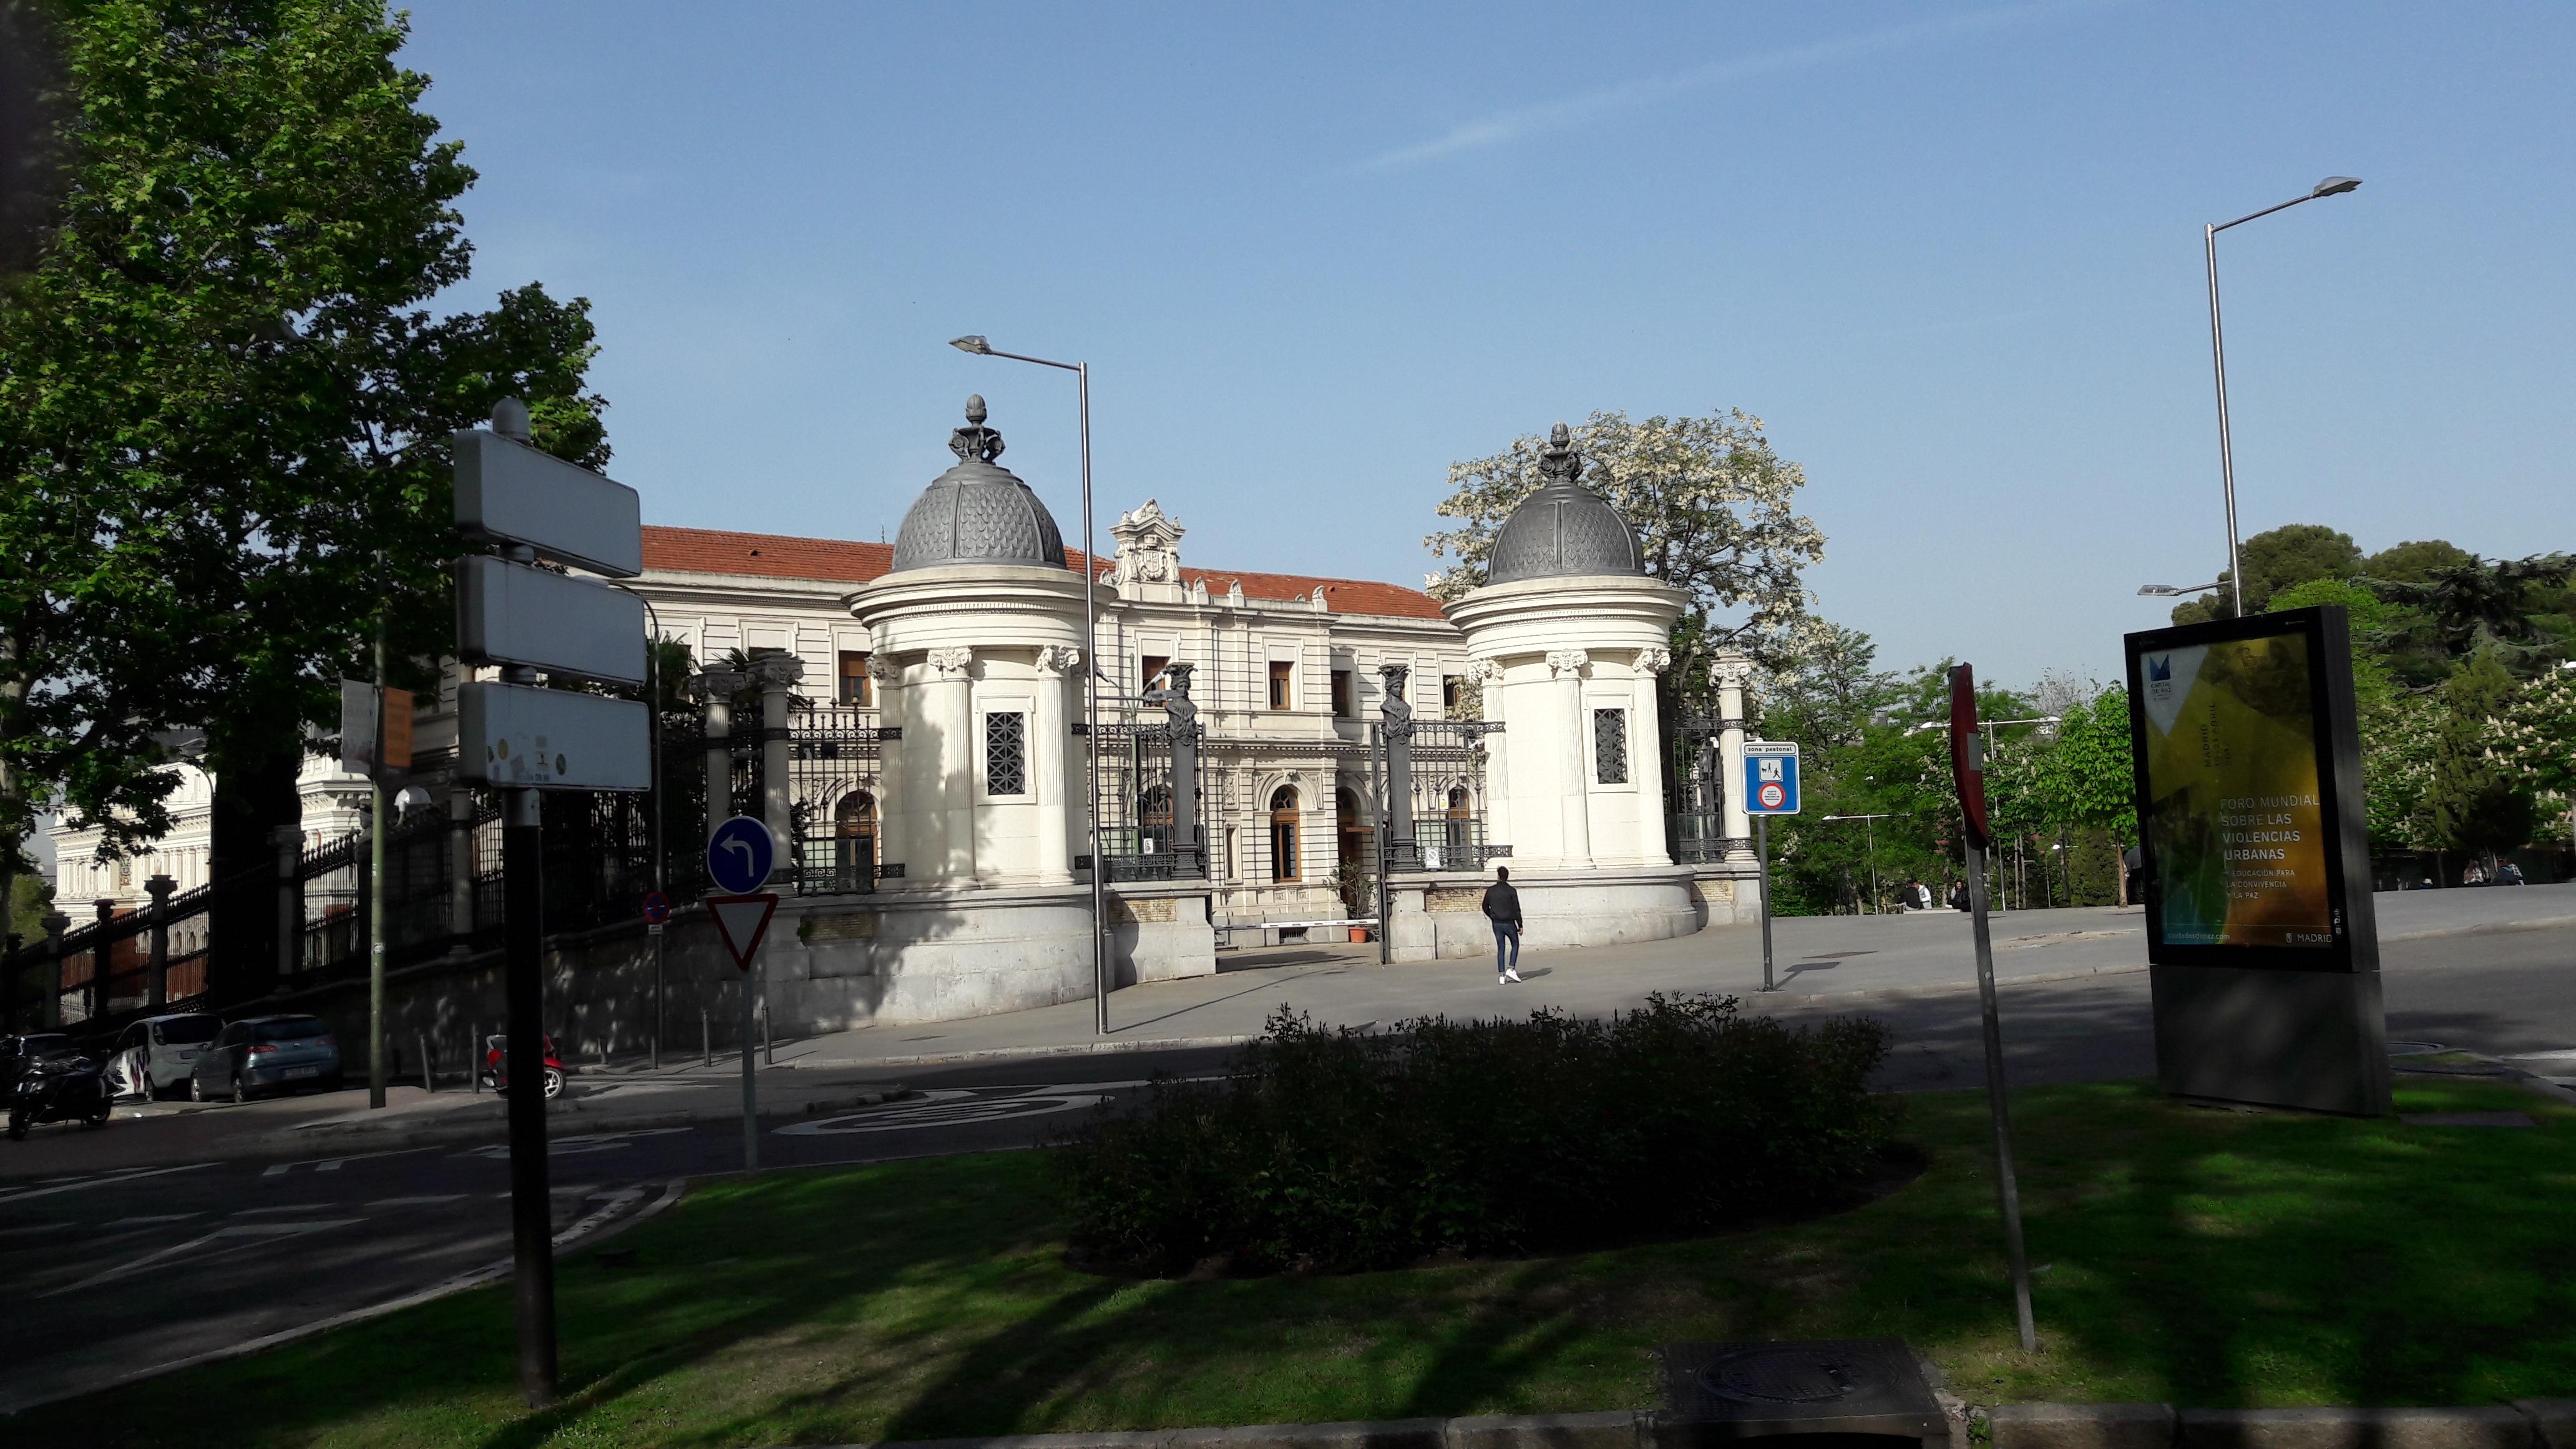 mad-min-agricultura-back-cuesta-moyano-palacio-de-fomento-apr17